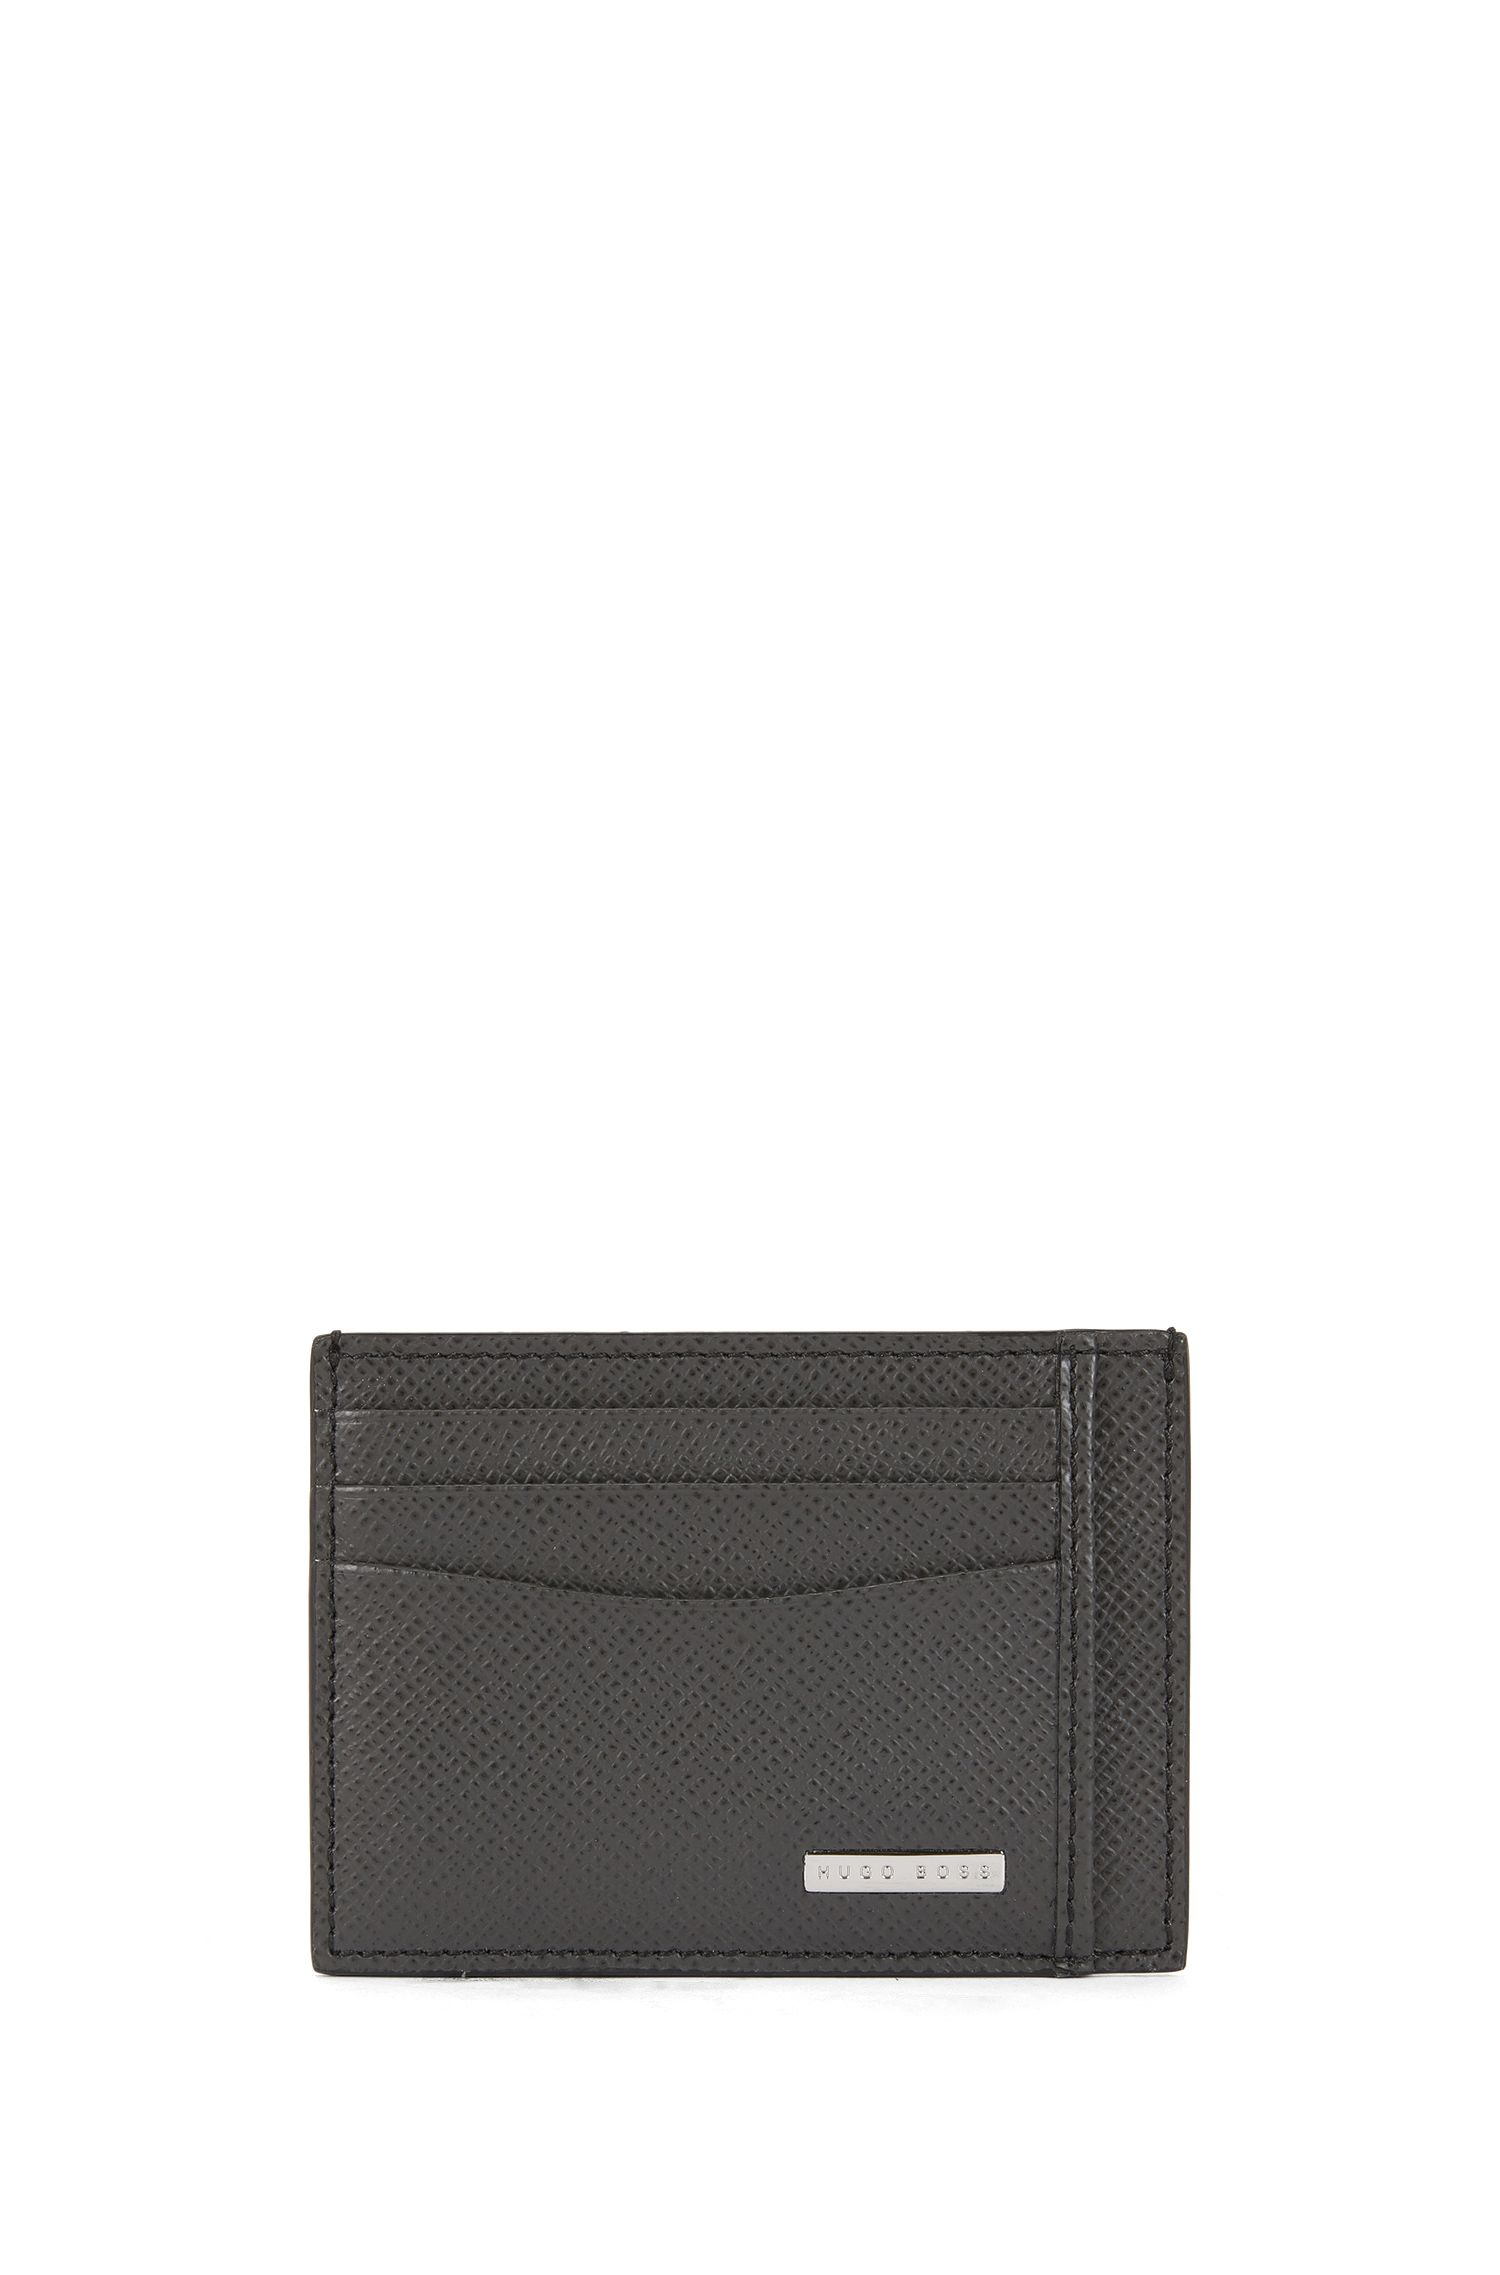 Porte-cartes Signature Collection, en cuir palmellato